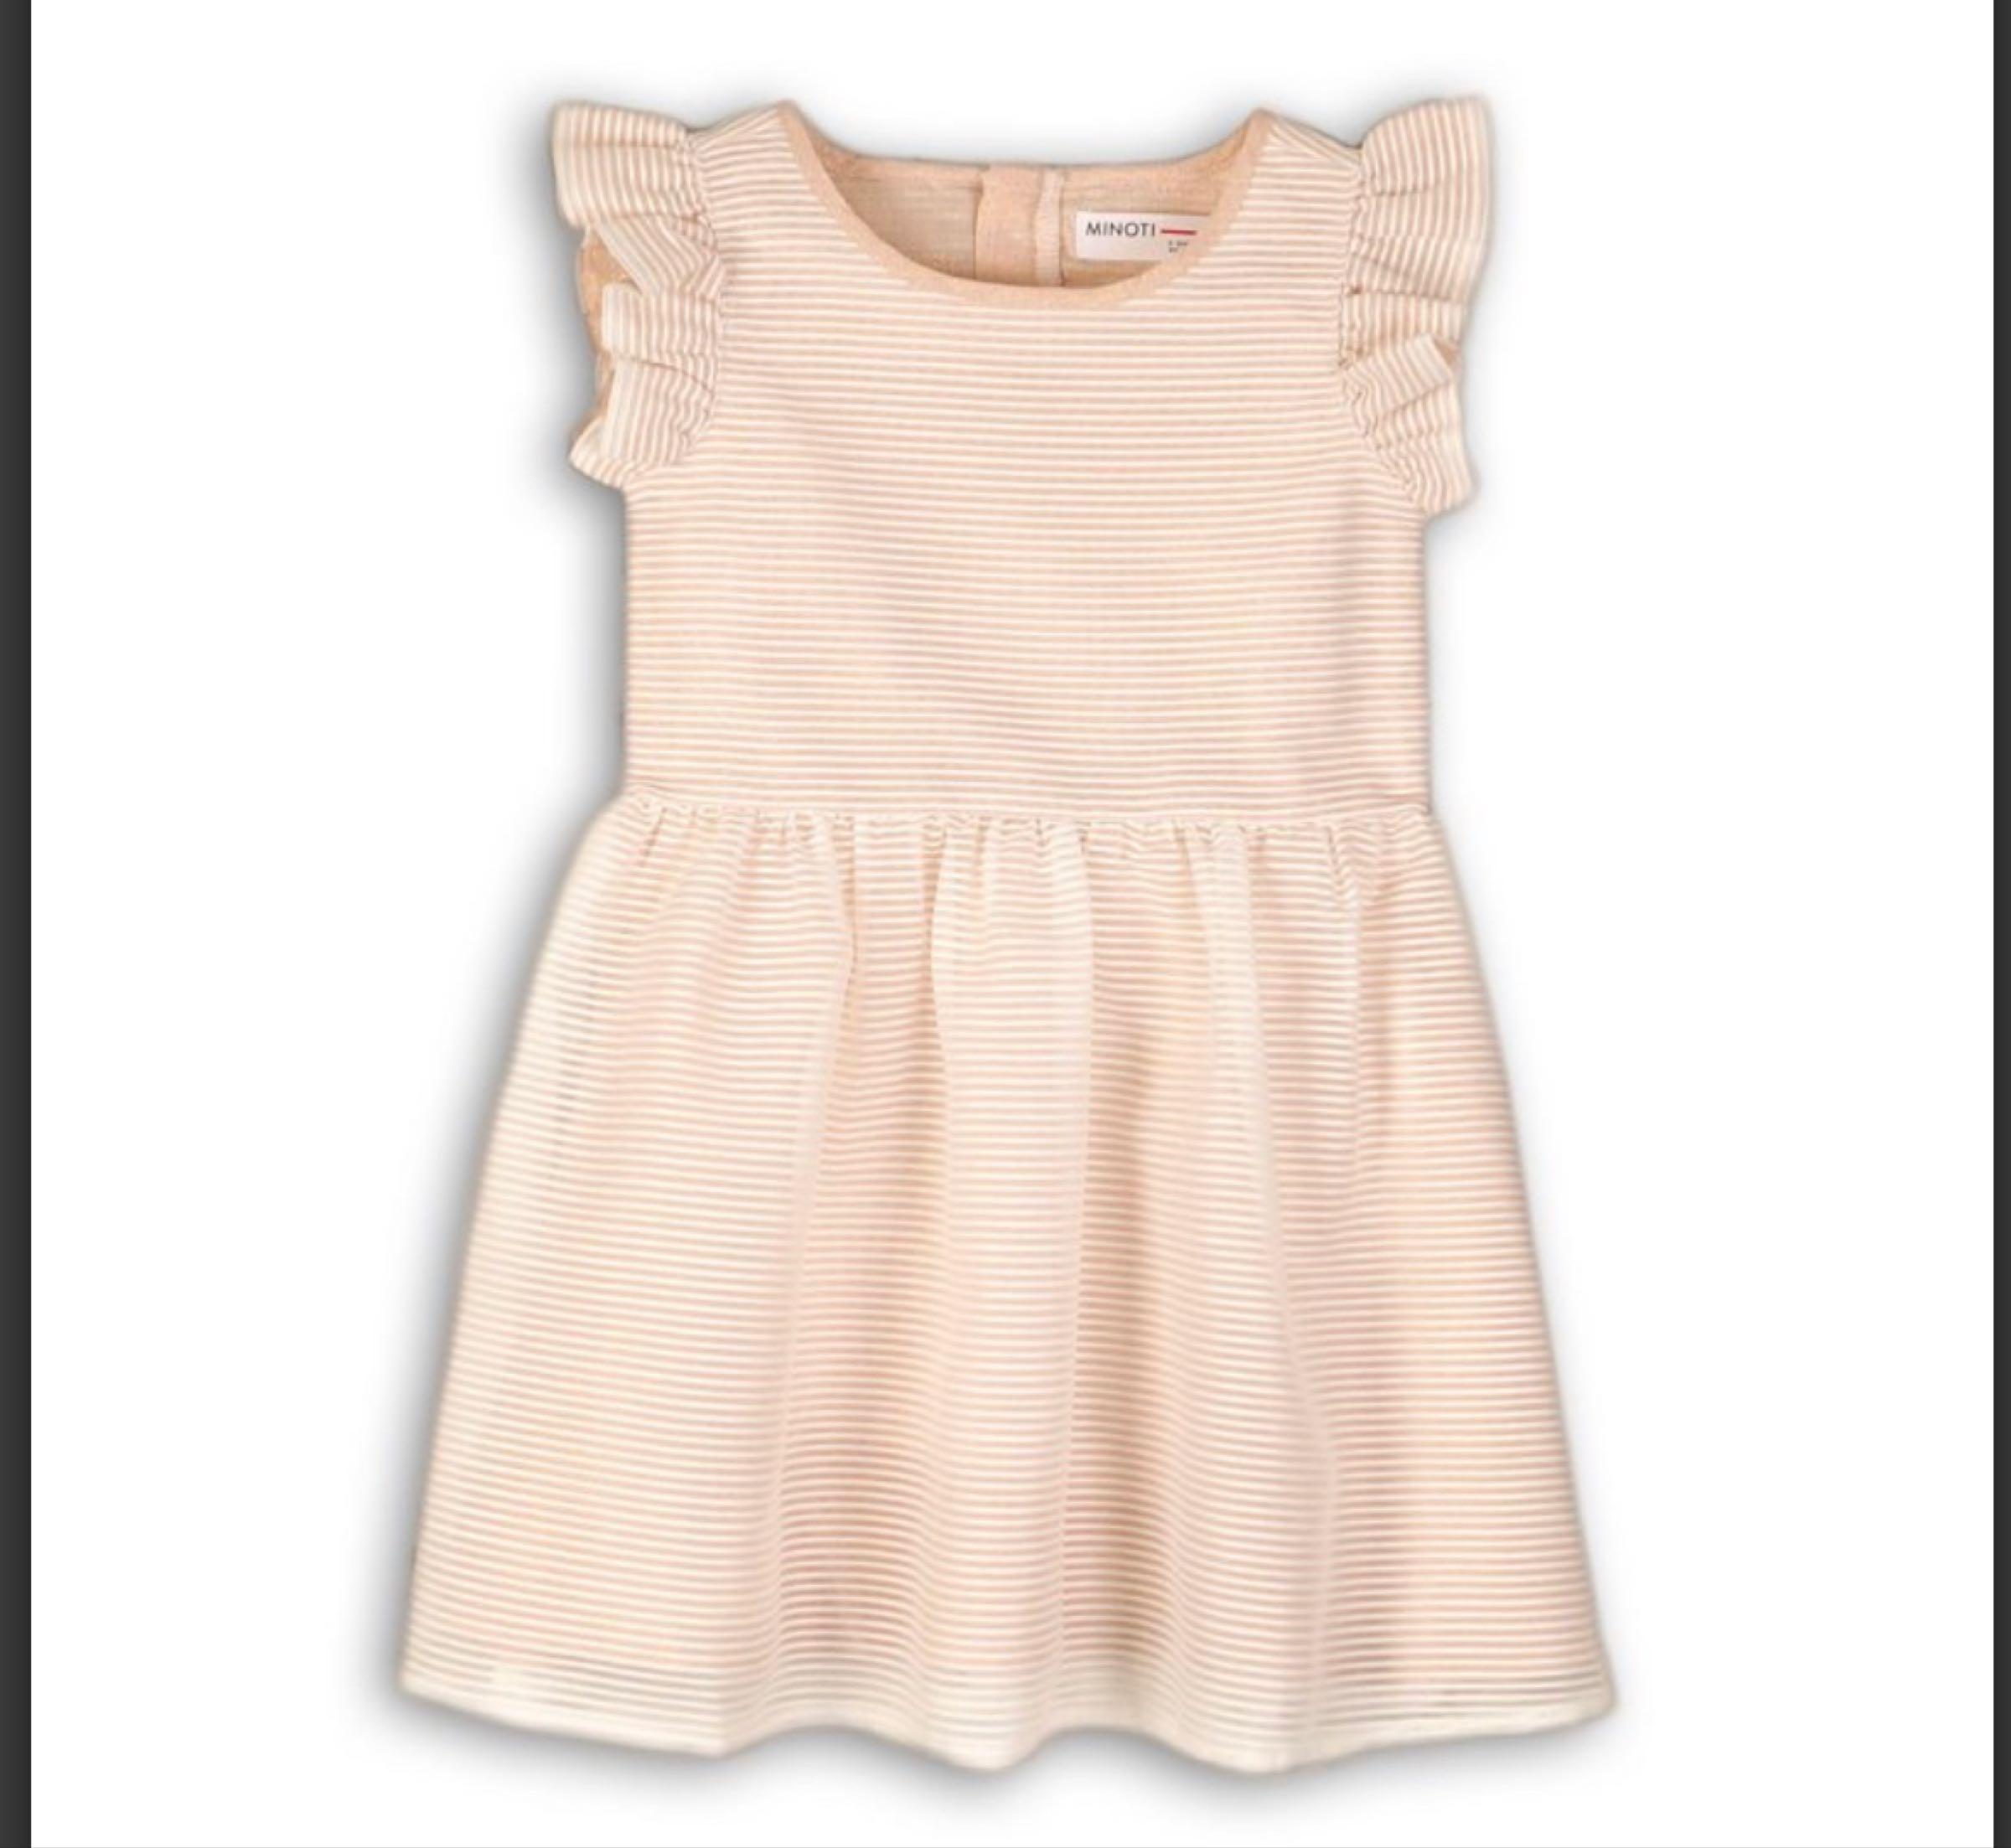 Mesh striped Sand Coloured Dress